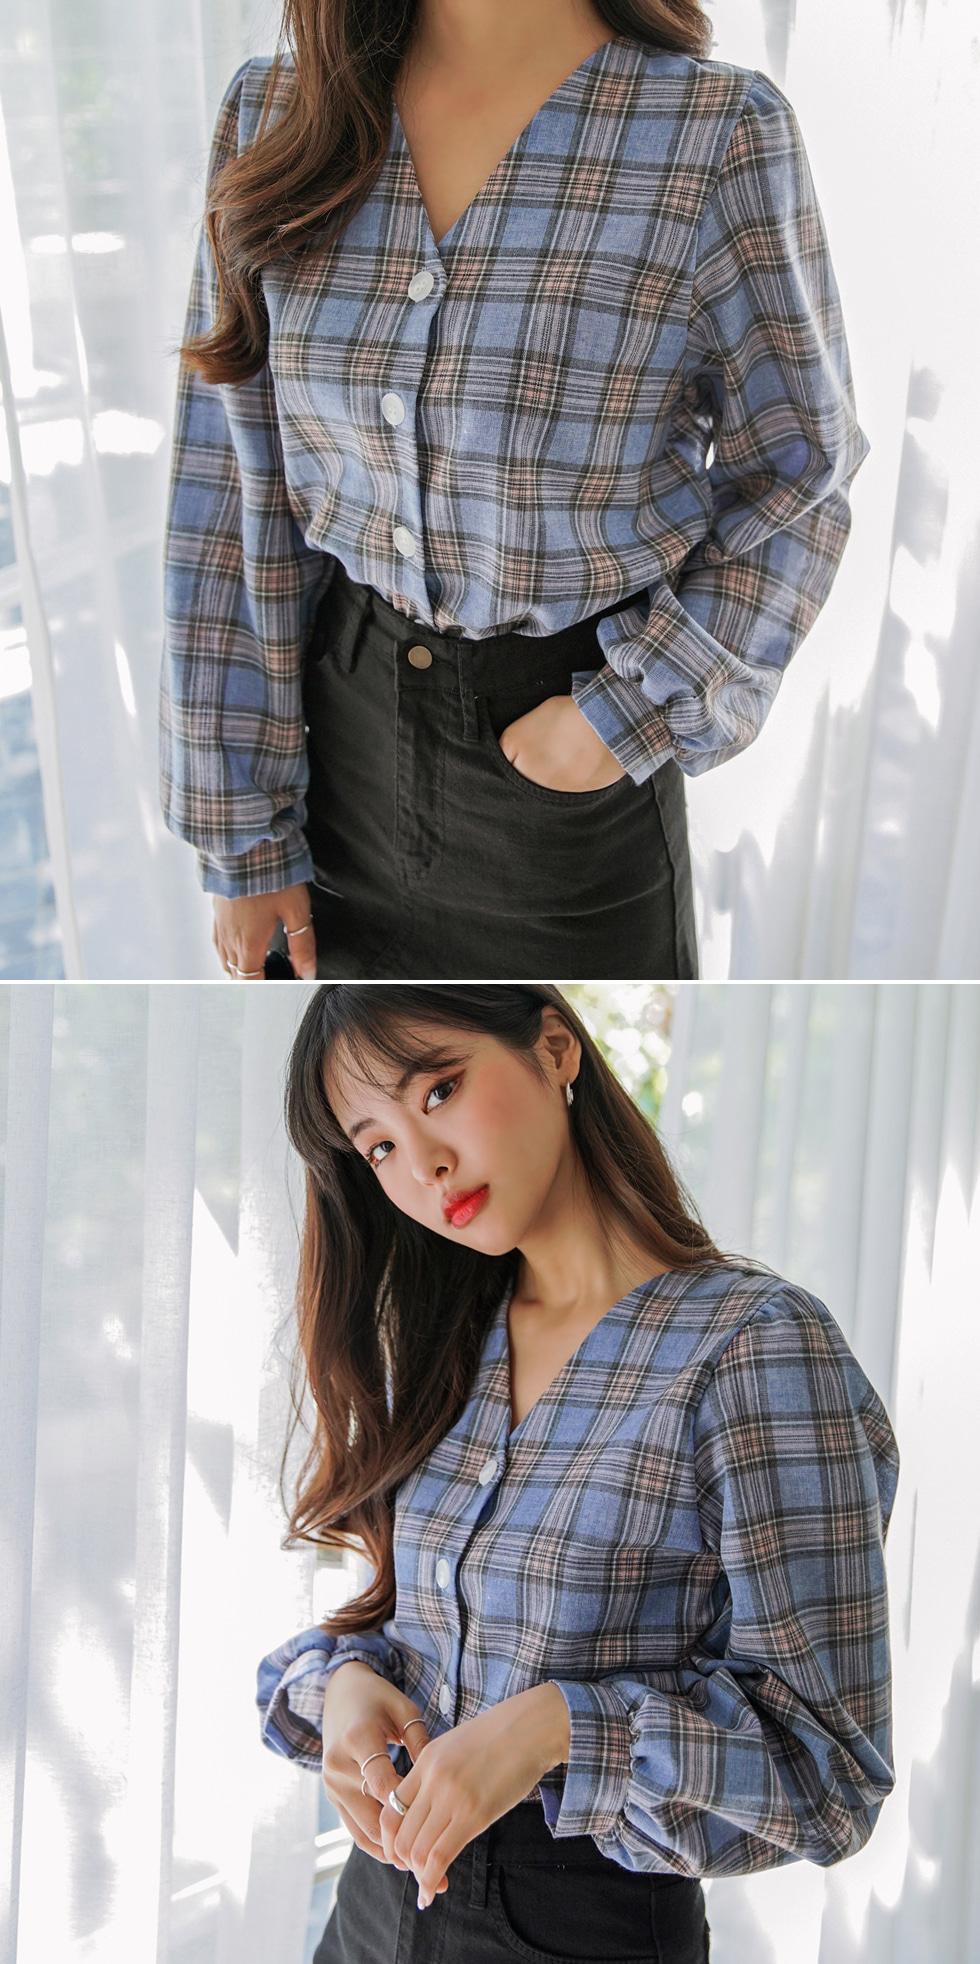 More check blouse